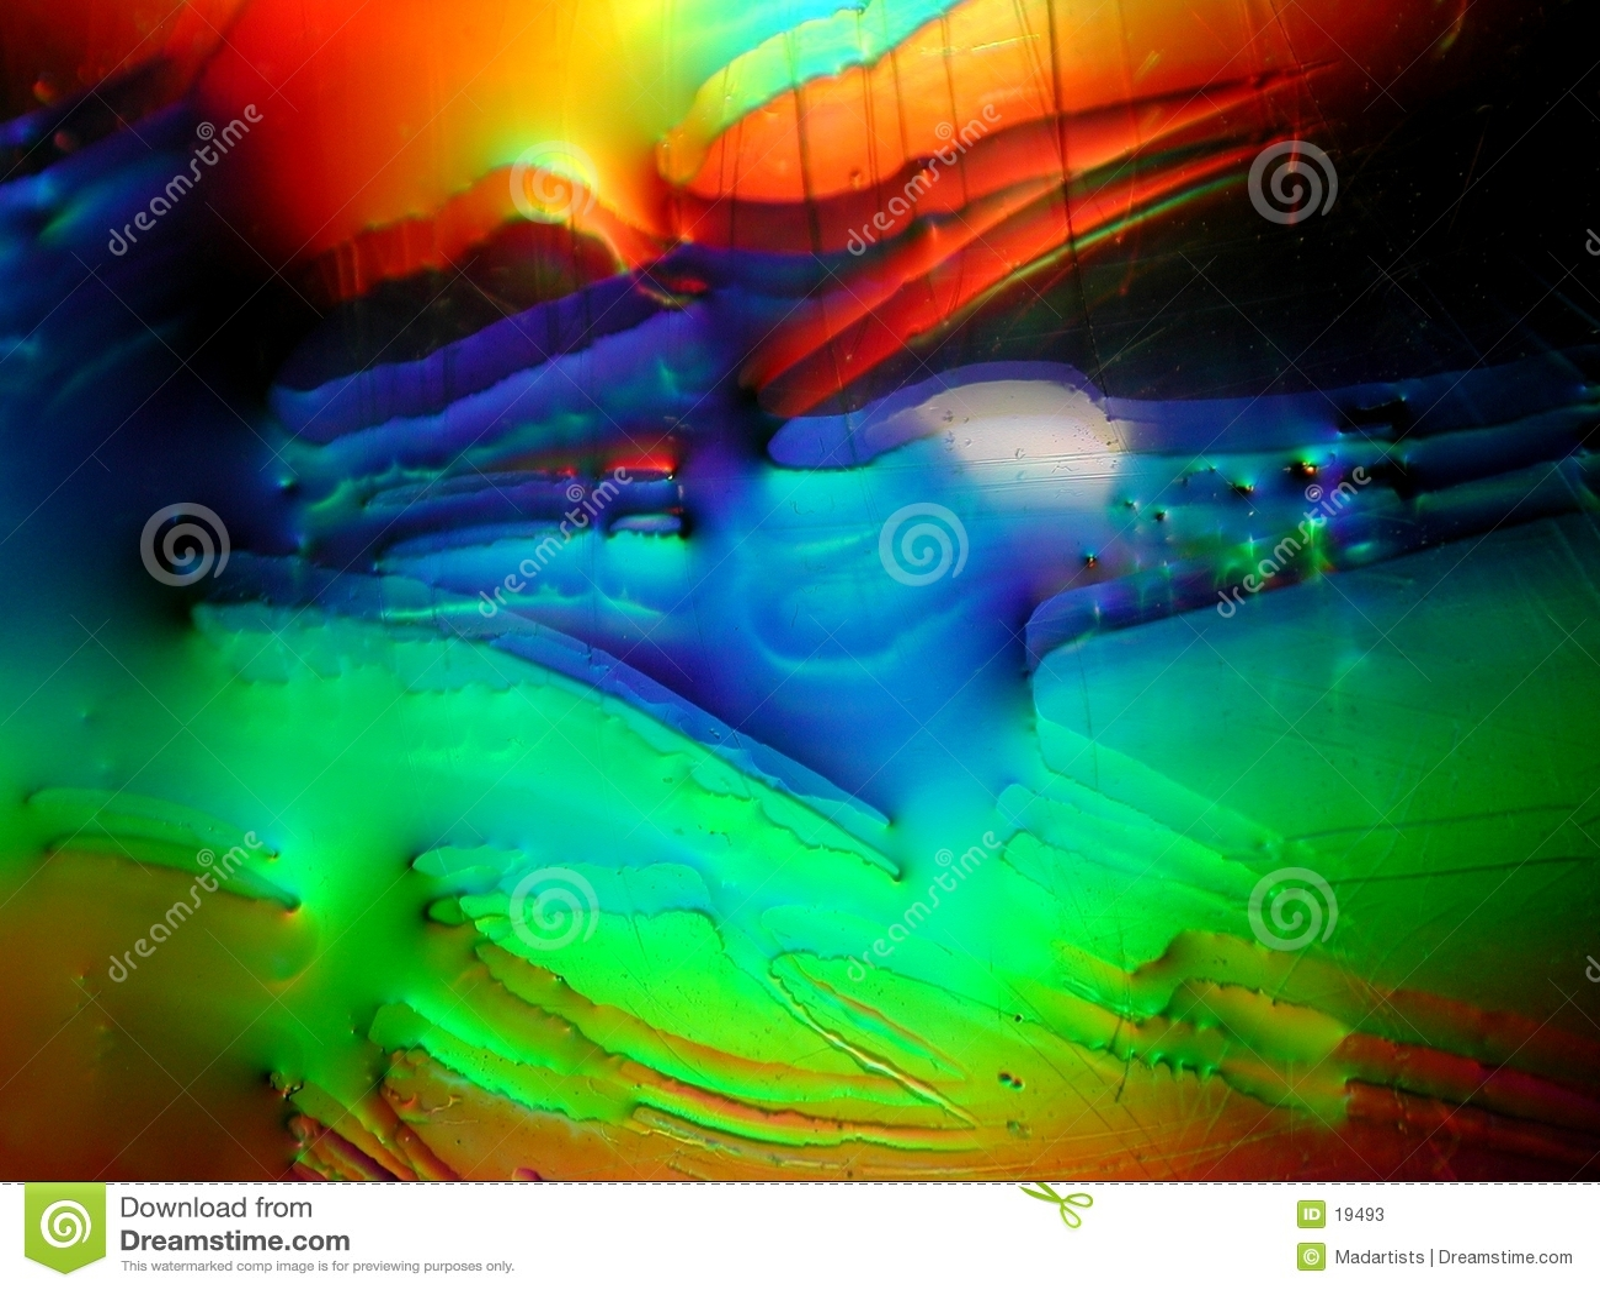 Grunge Paint Liquid Texture